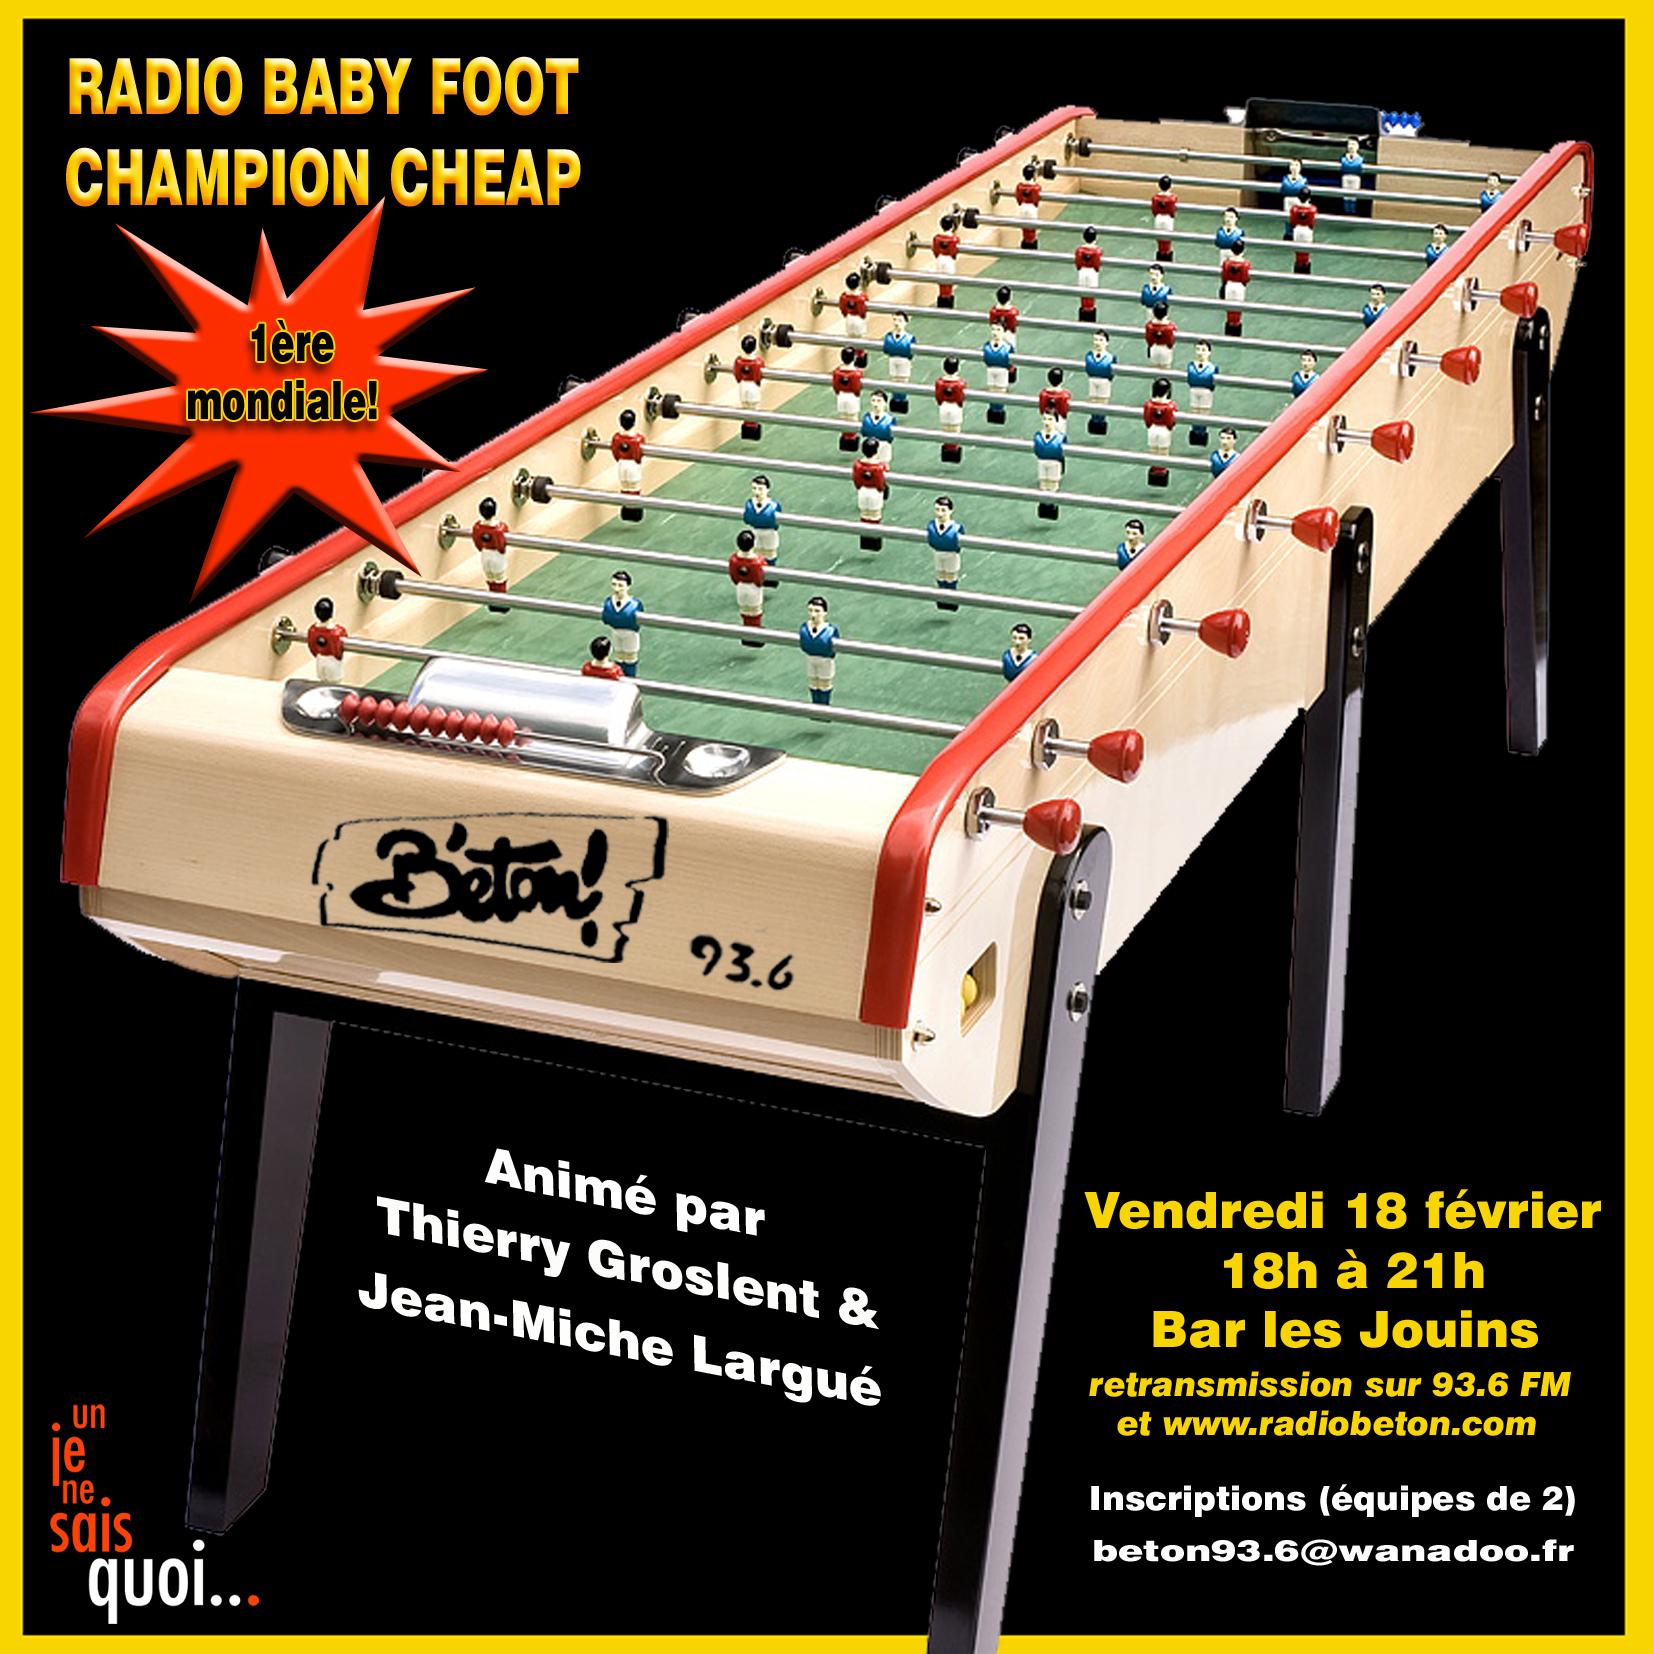 Radio Baby Foot Champion Cheap